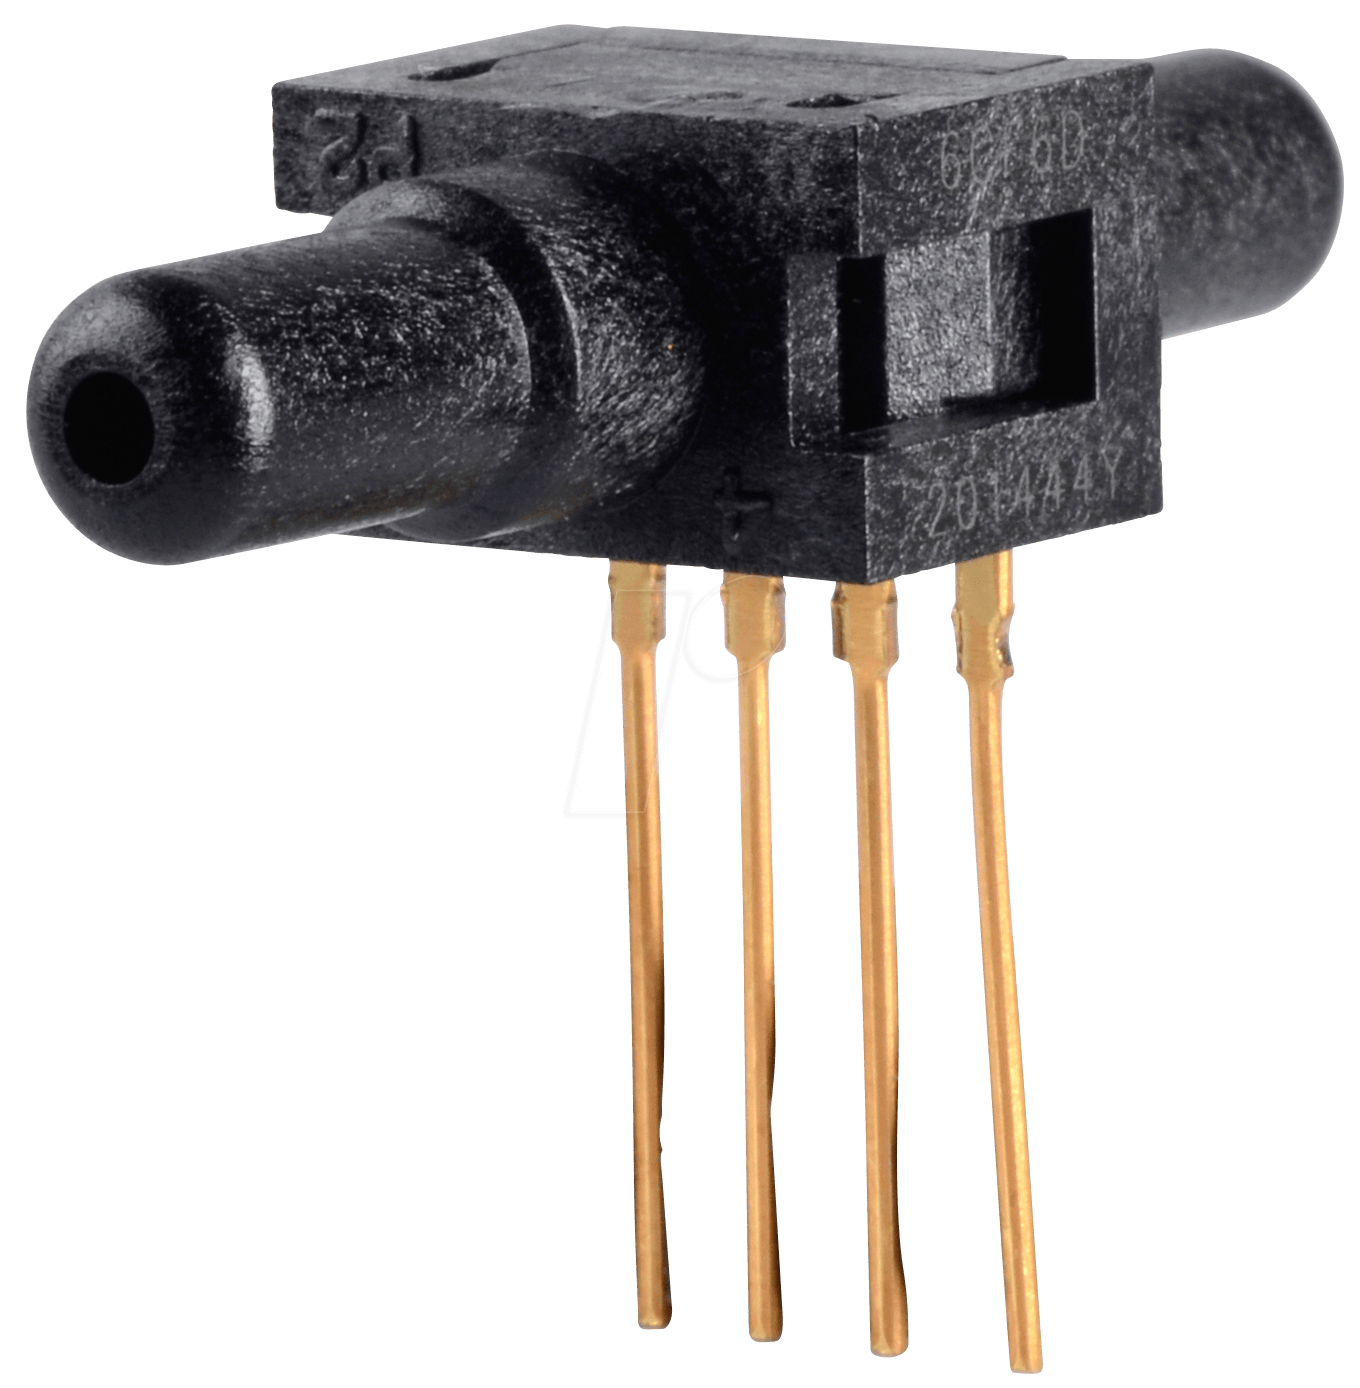 26 PCCFA6D - Differenzdrucksensor, relativ, ± 15 psi